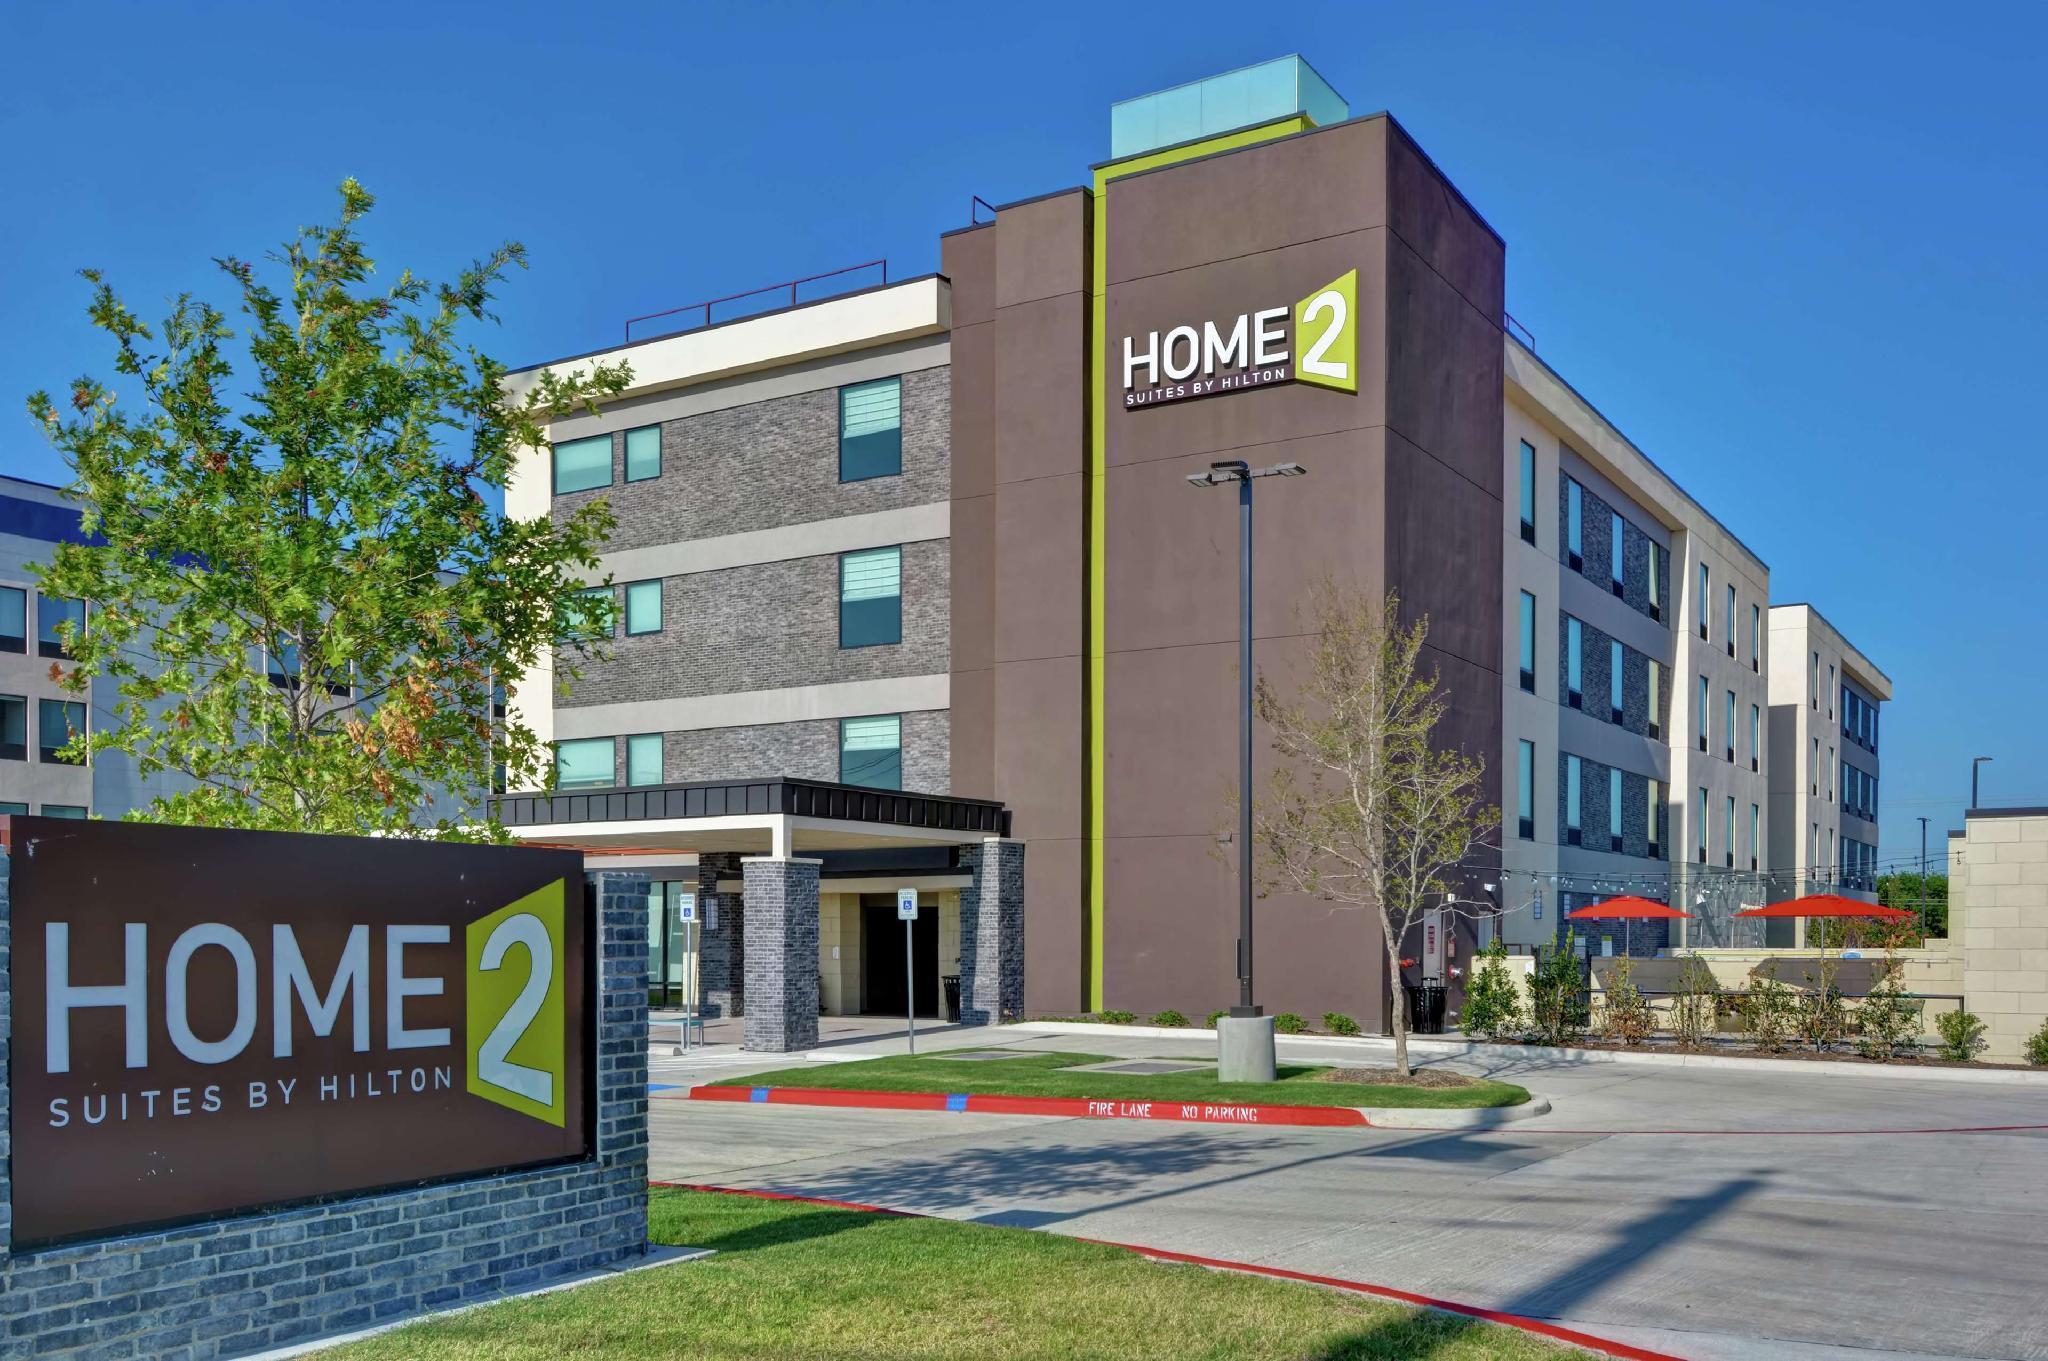 Home2 Suites by Hilton McKinney, TX